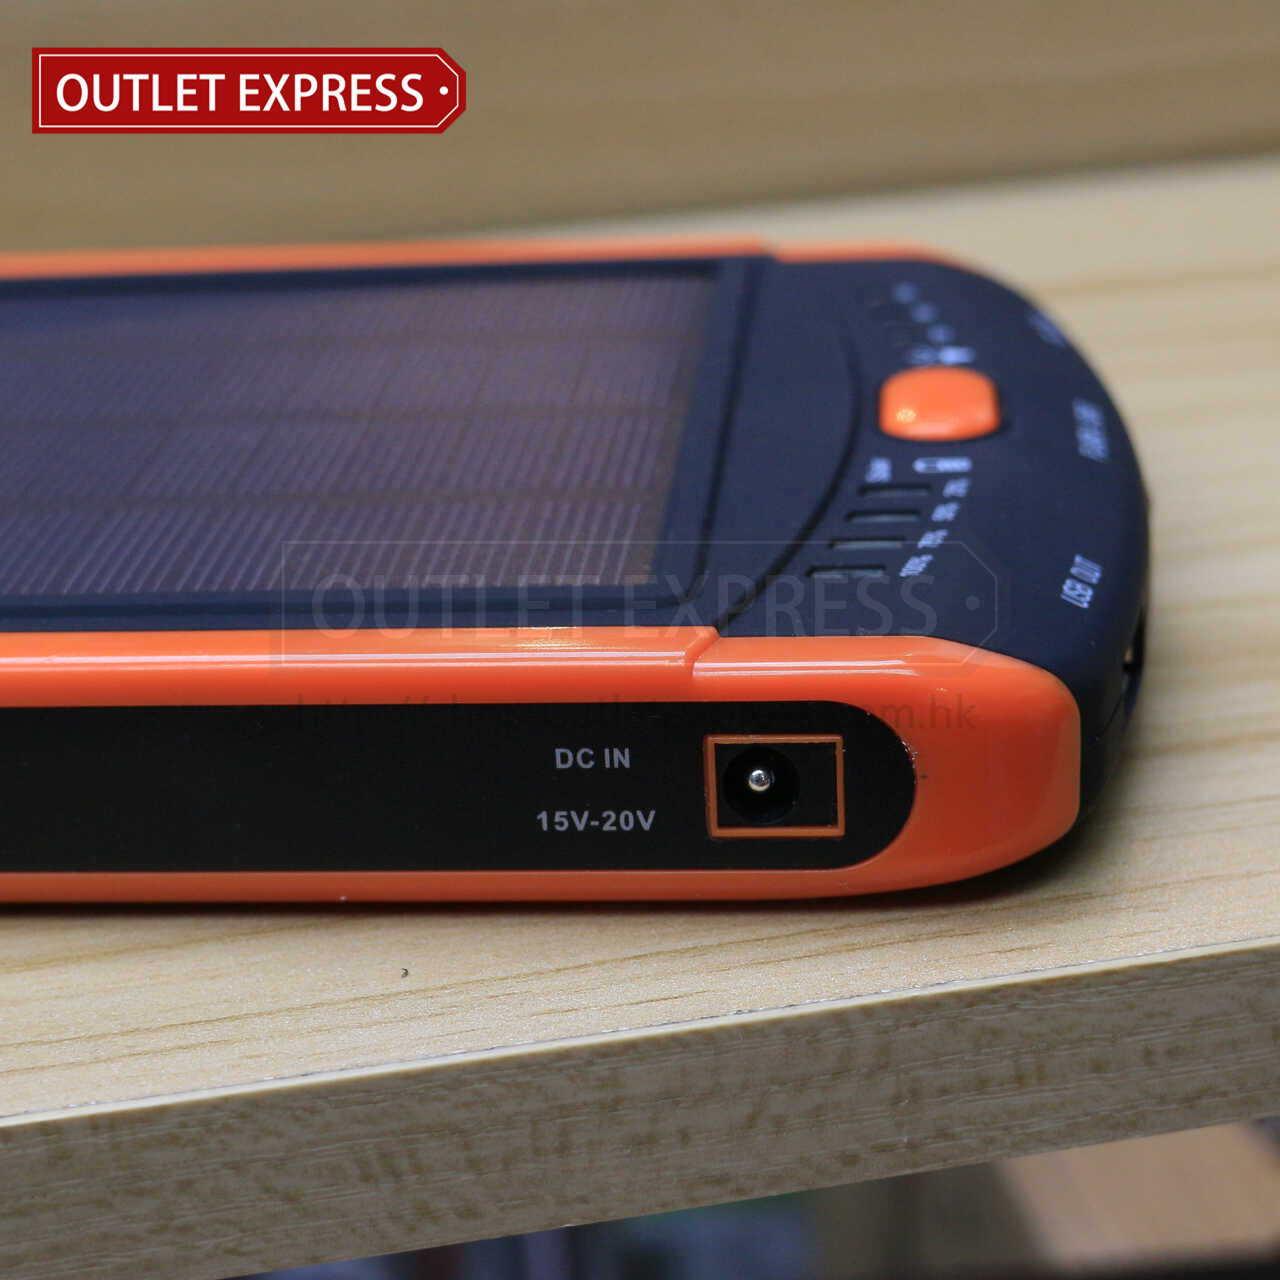 23000mAH 超薄太陽能移動電源 直流電插口- Outlet Express HK 生活百貨城實拍圖